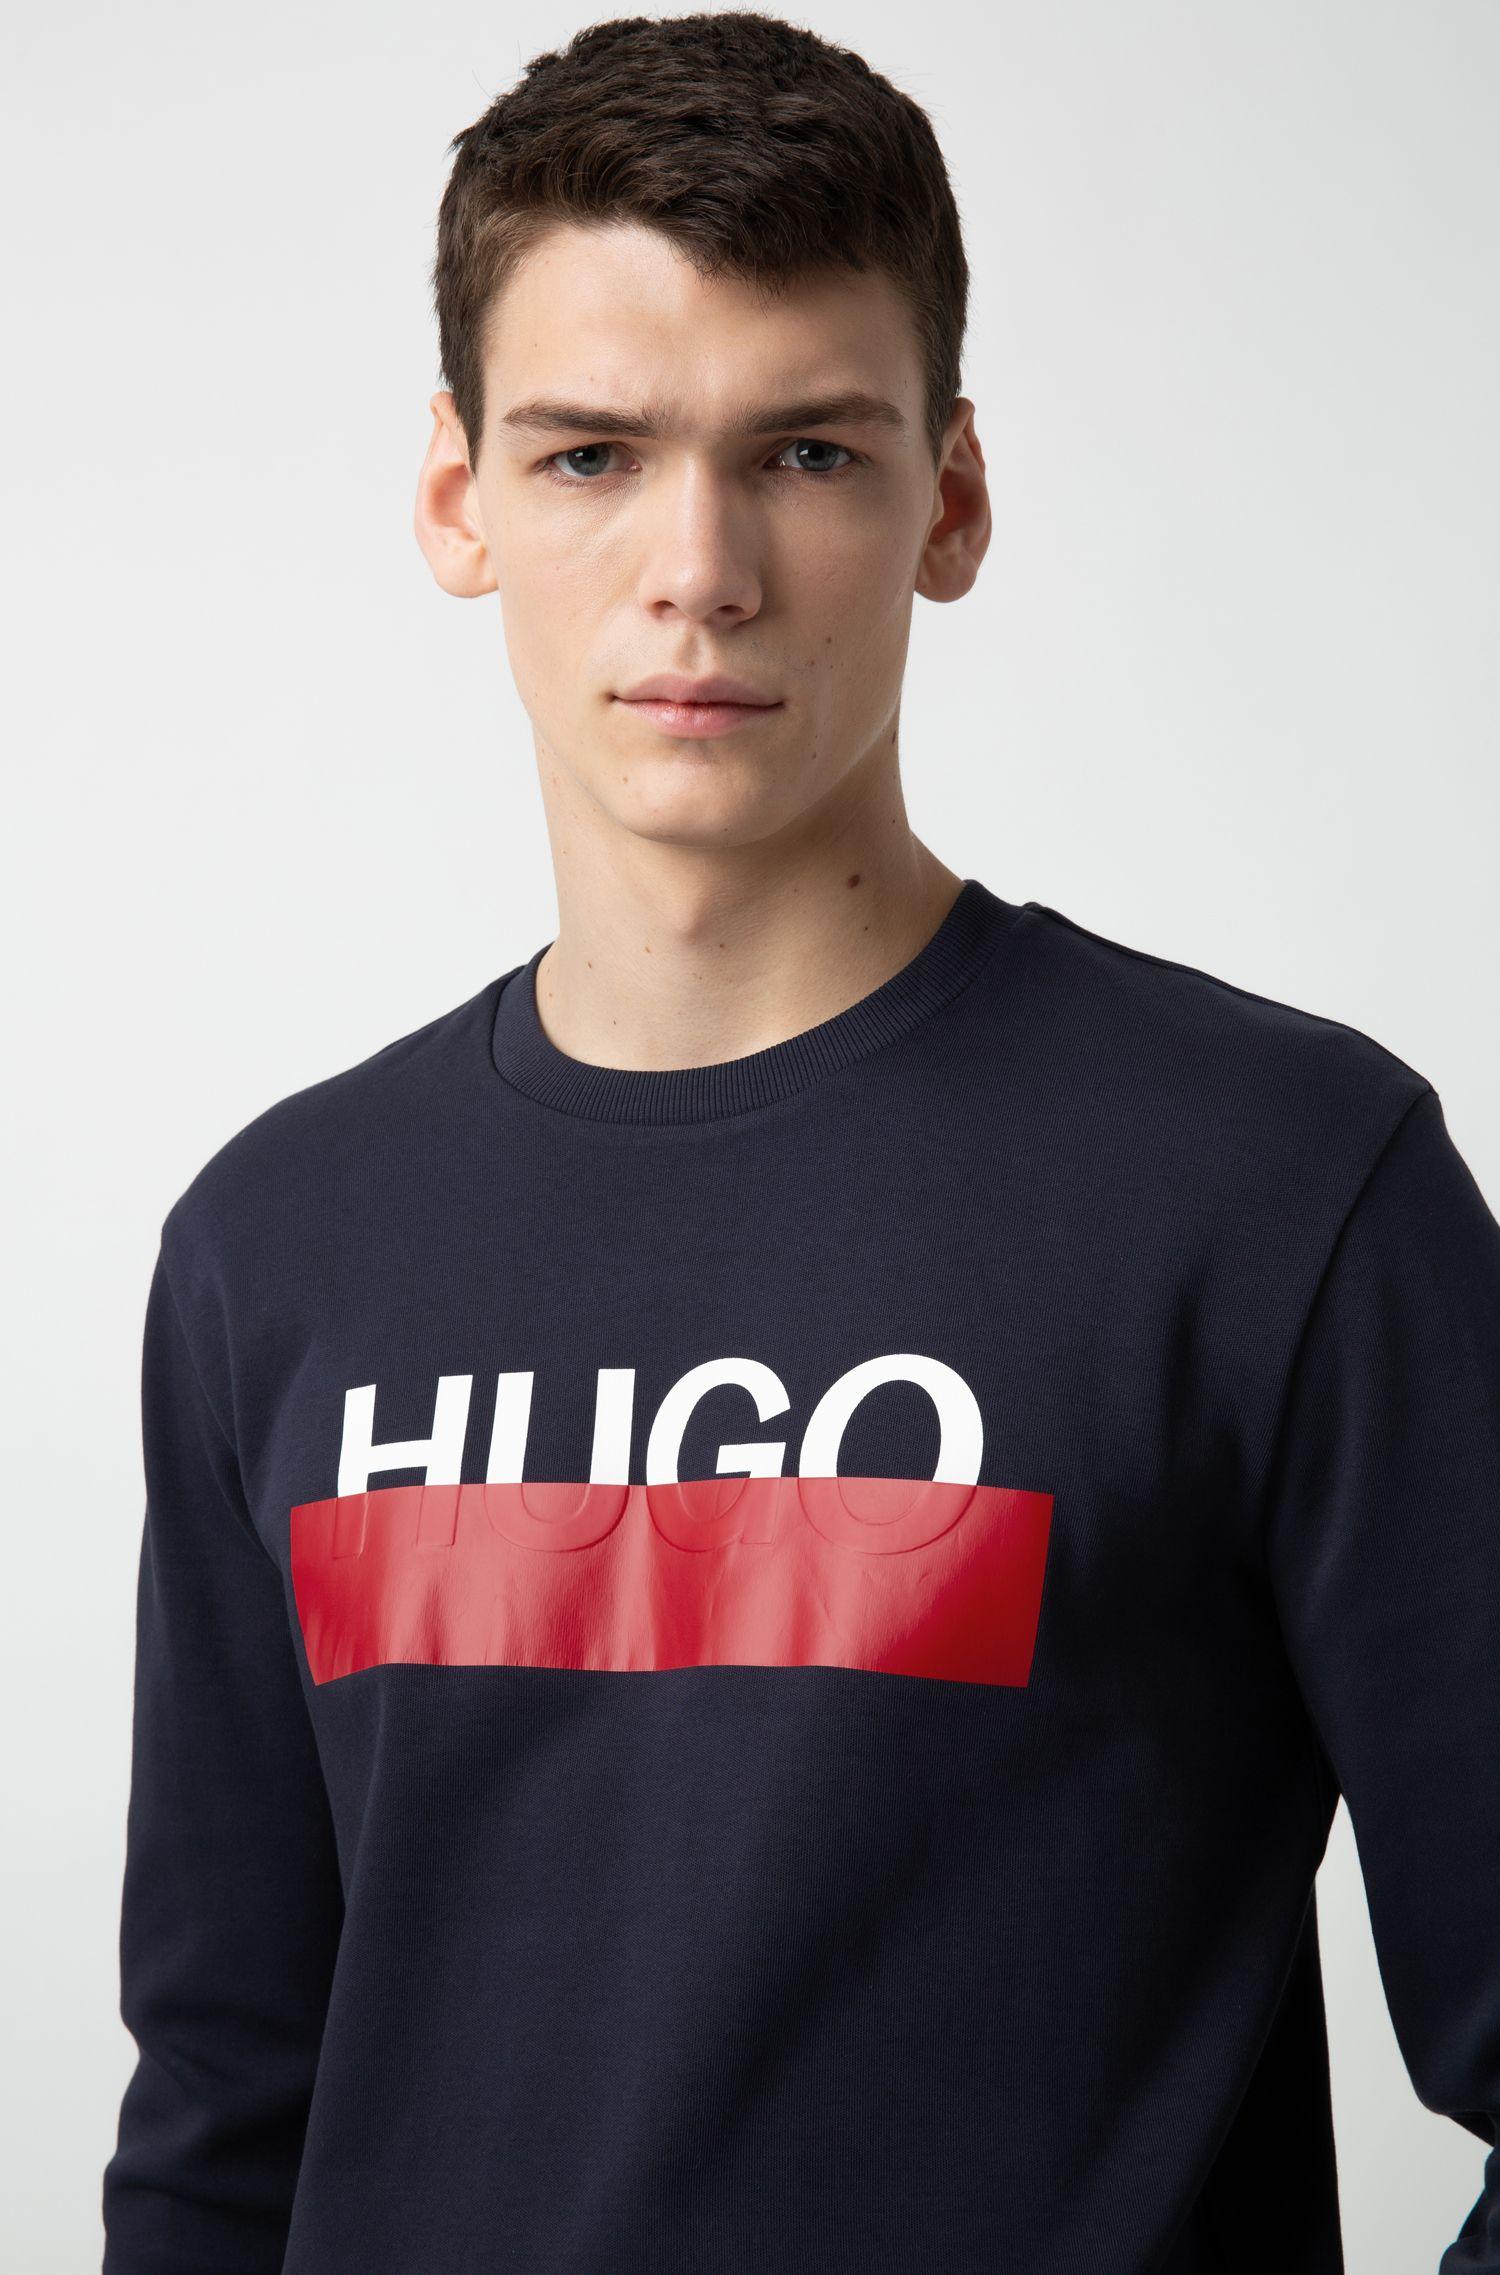 Hugo Boss - Interlock-cotton sweatshirt with partially concealed logo - 3